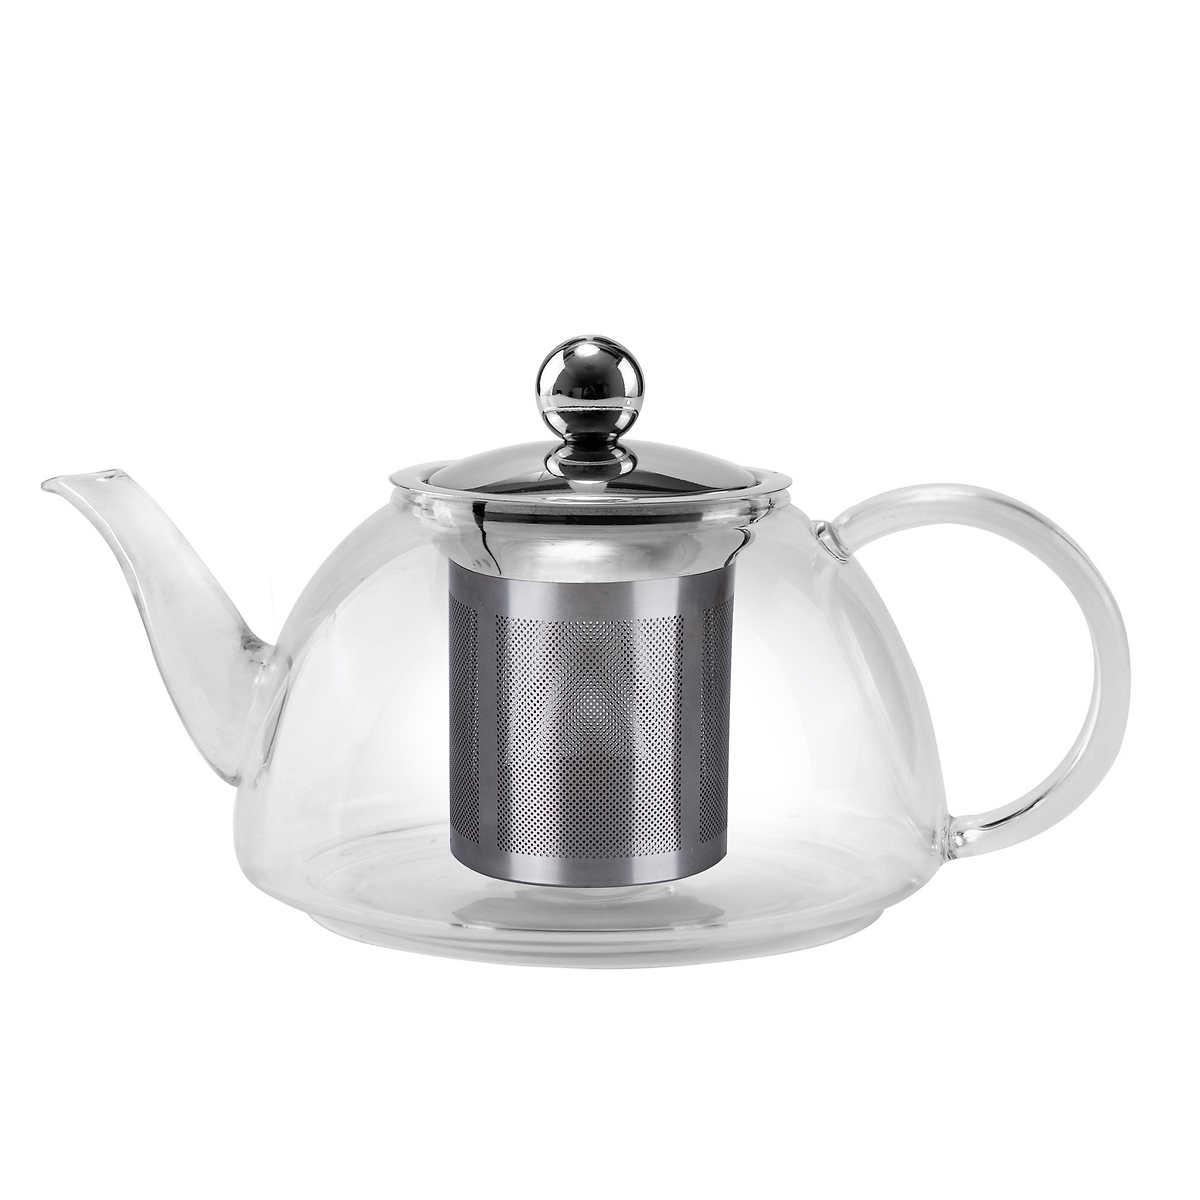 stove top safe pyrex glass teapot - click to zoom